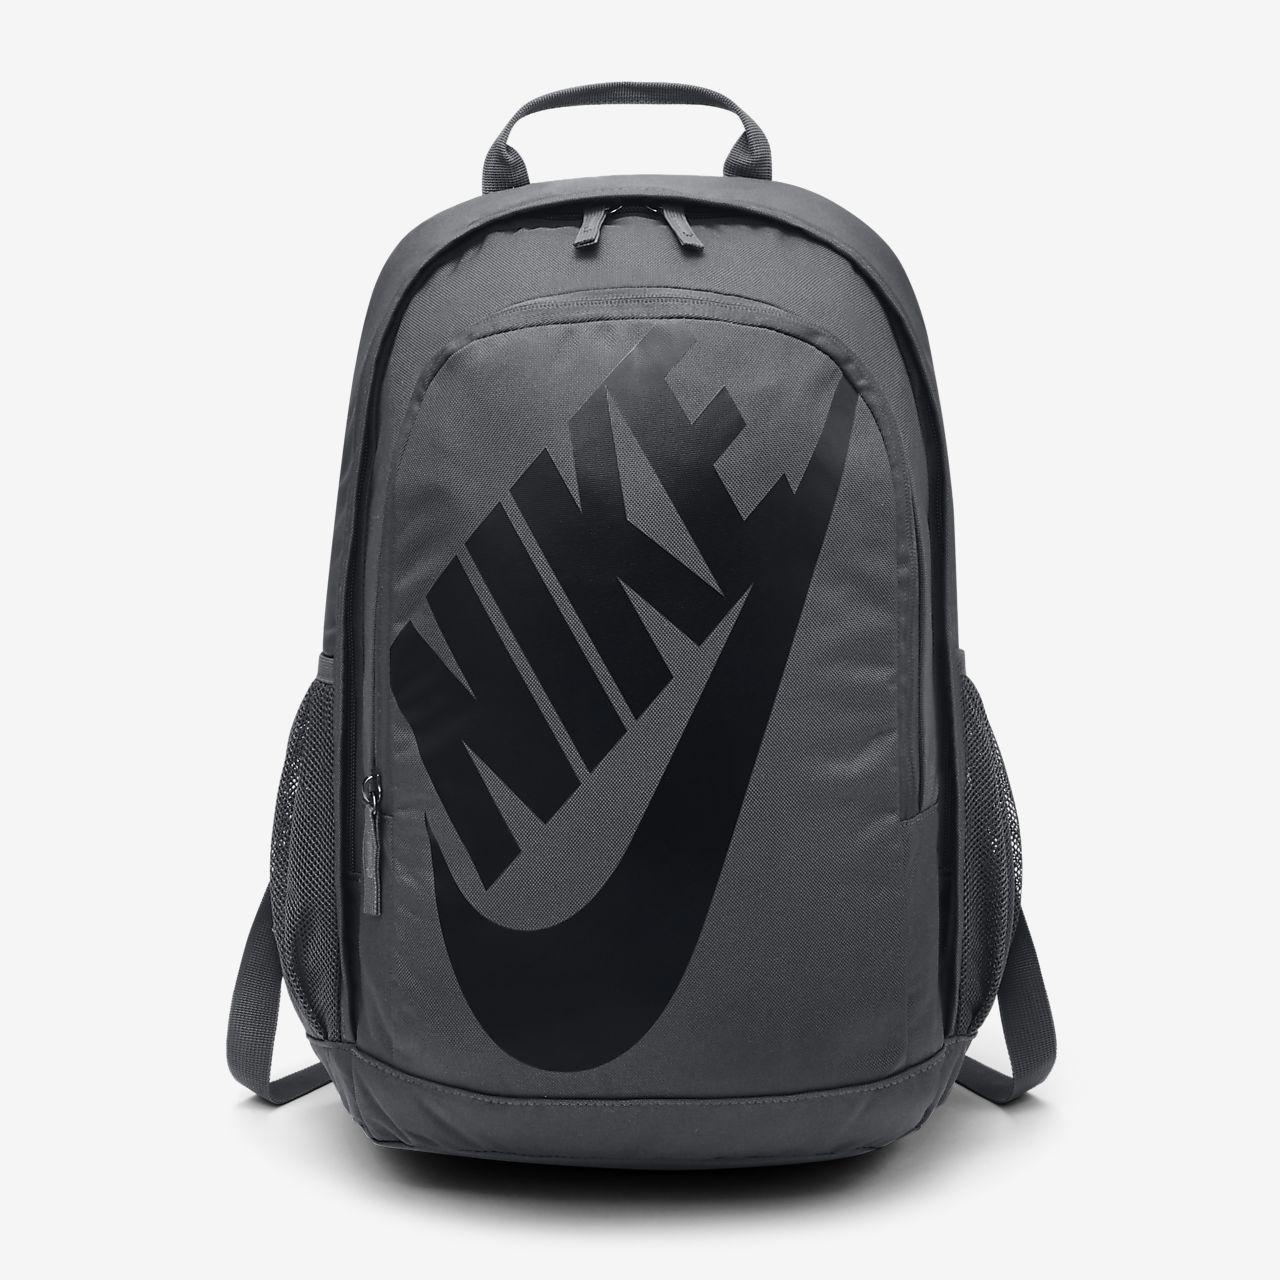 Mochila Nike Sportswear Hayward Futura 2.0